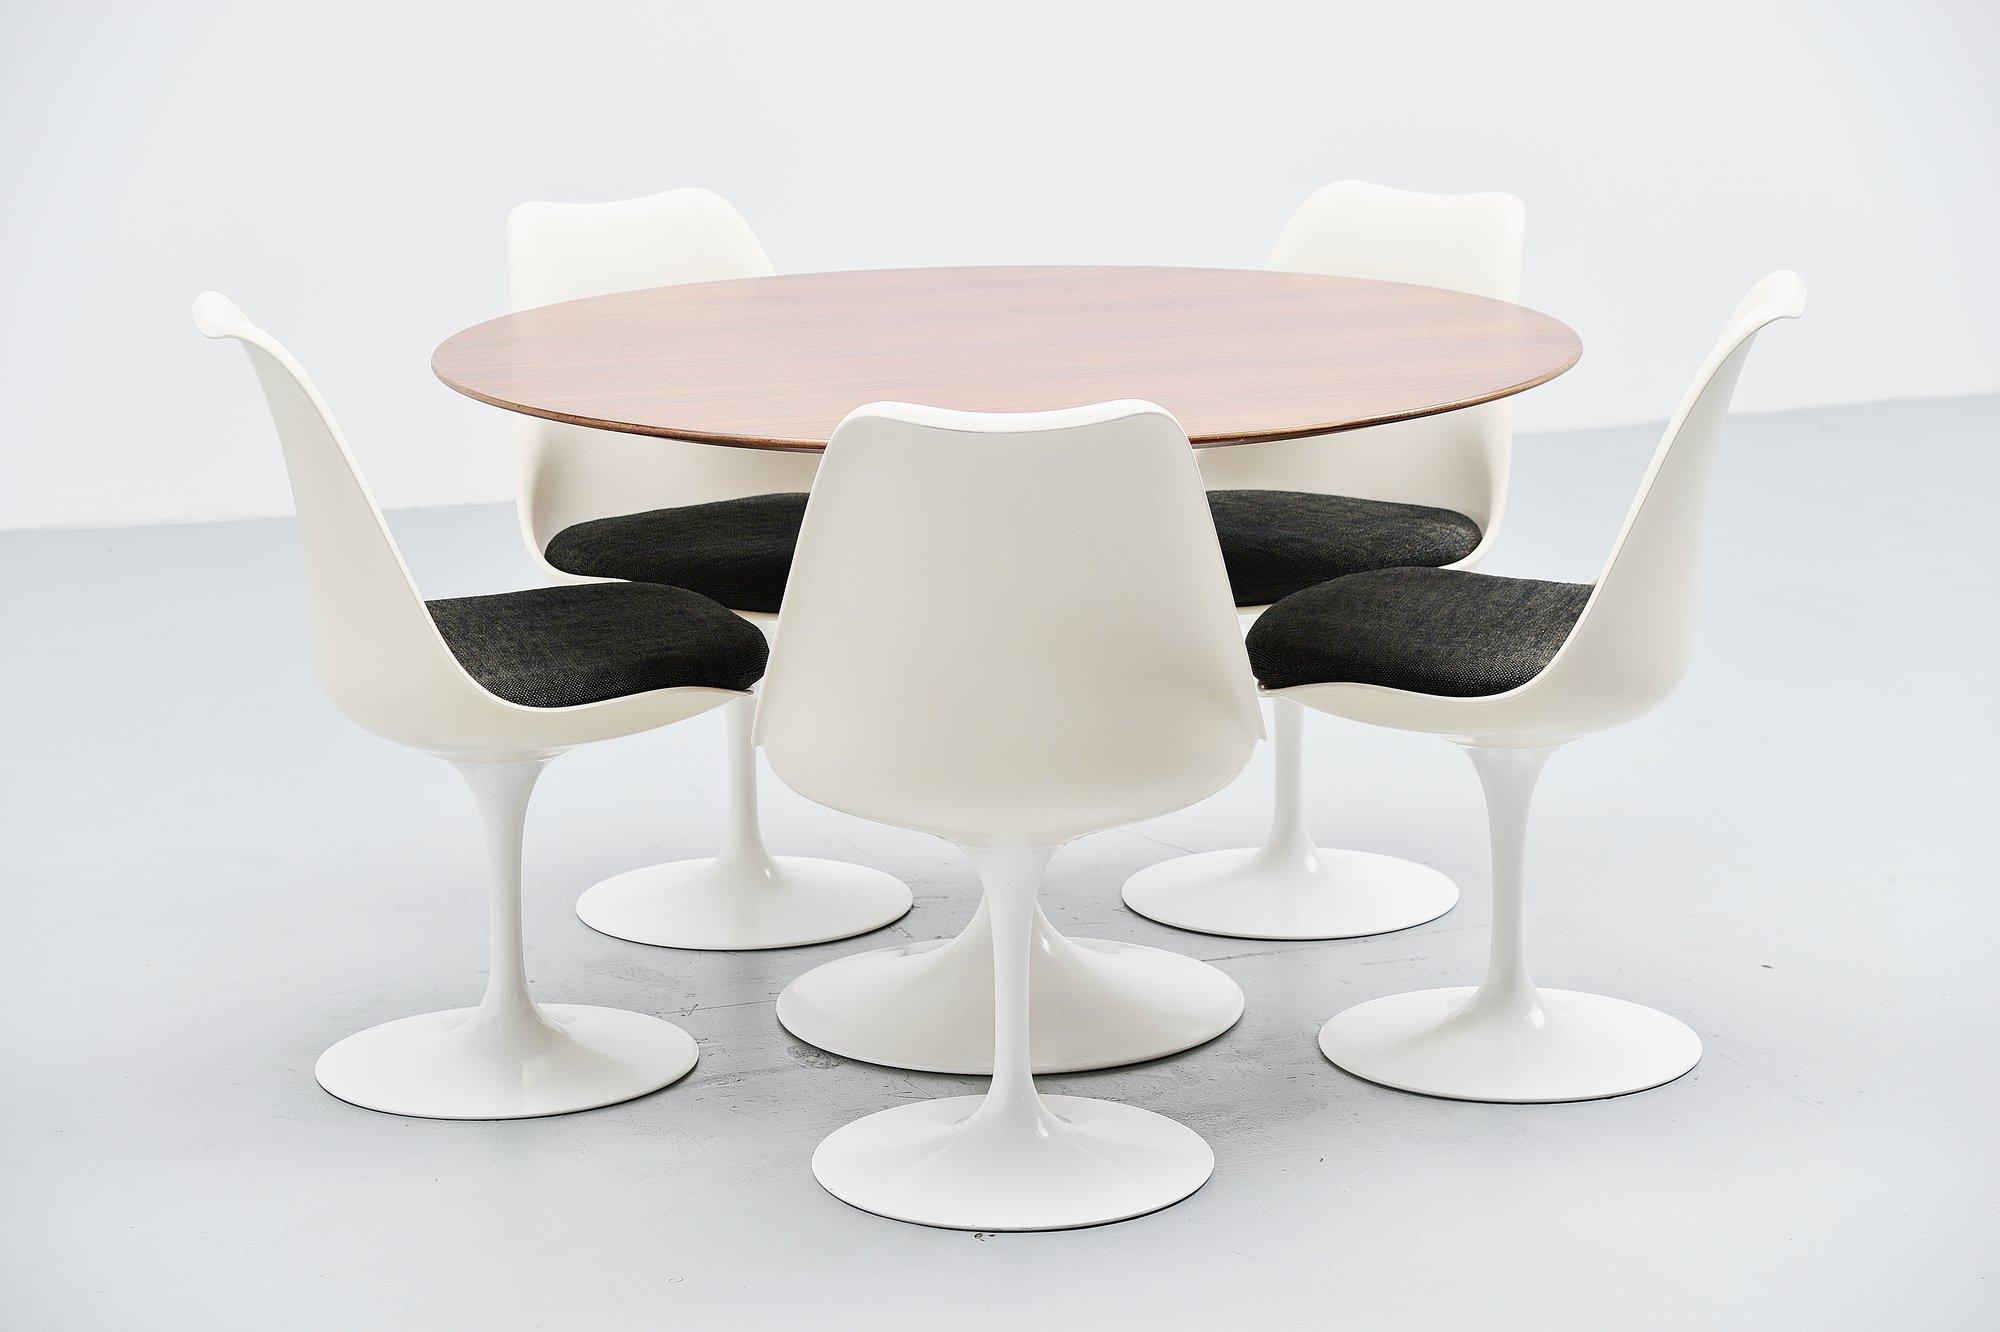 Eero Saarinen Tulip Table Set Knoll International 1956